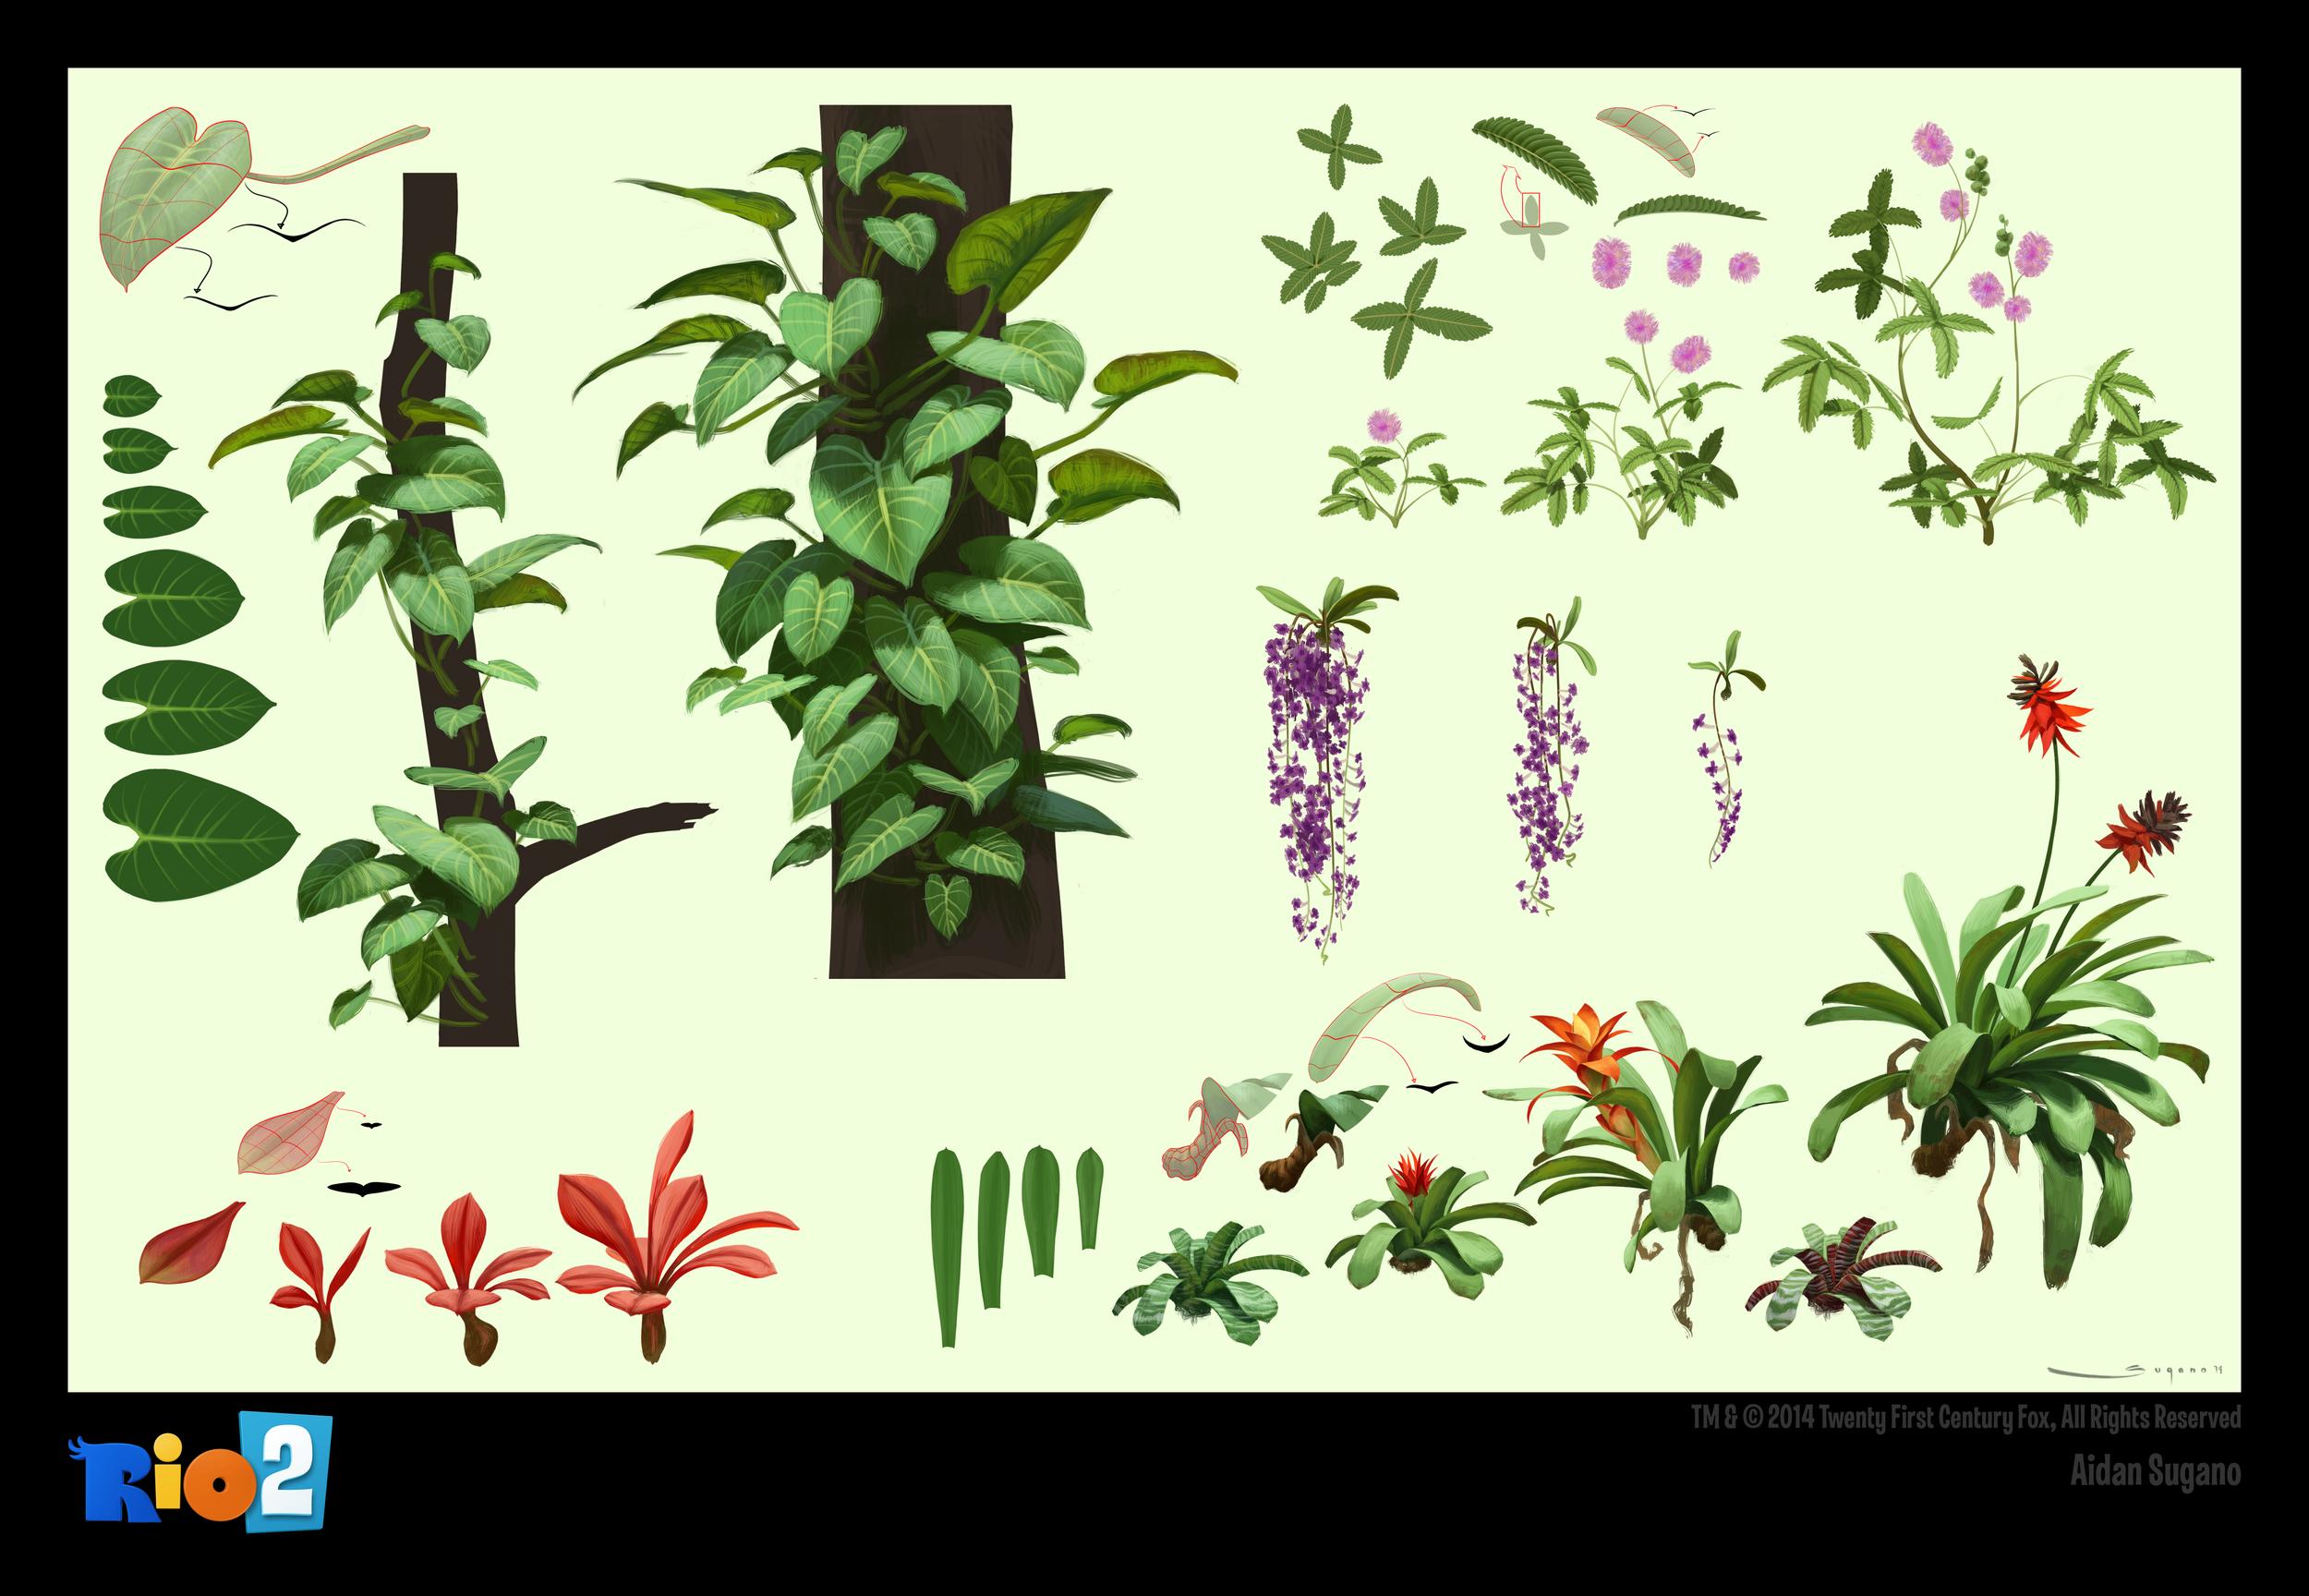 as_river_plants_01.jpg